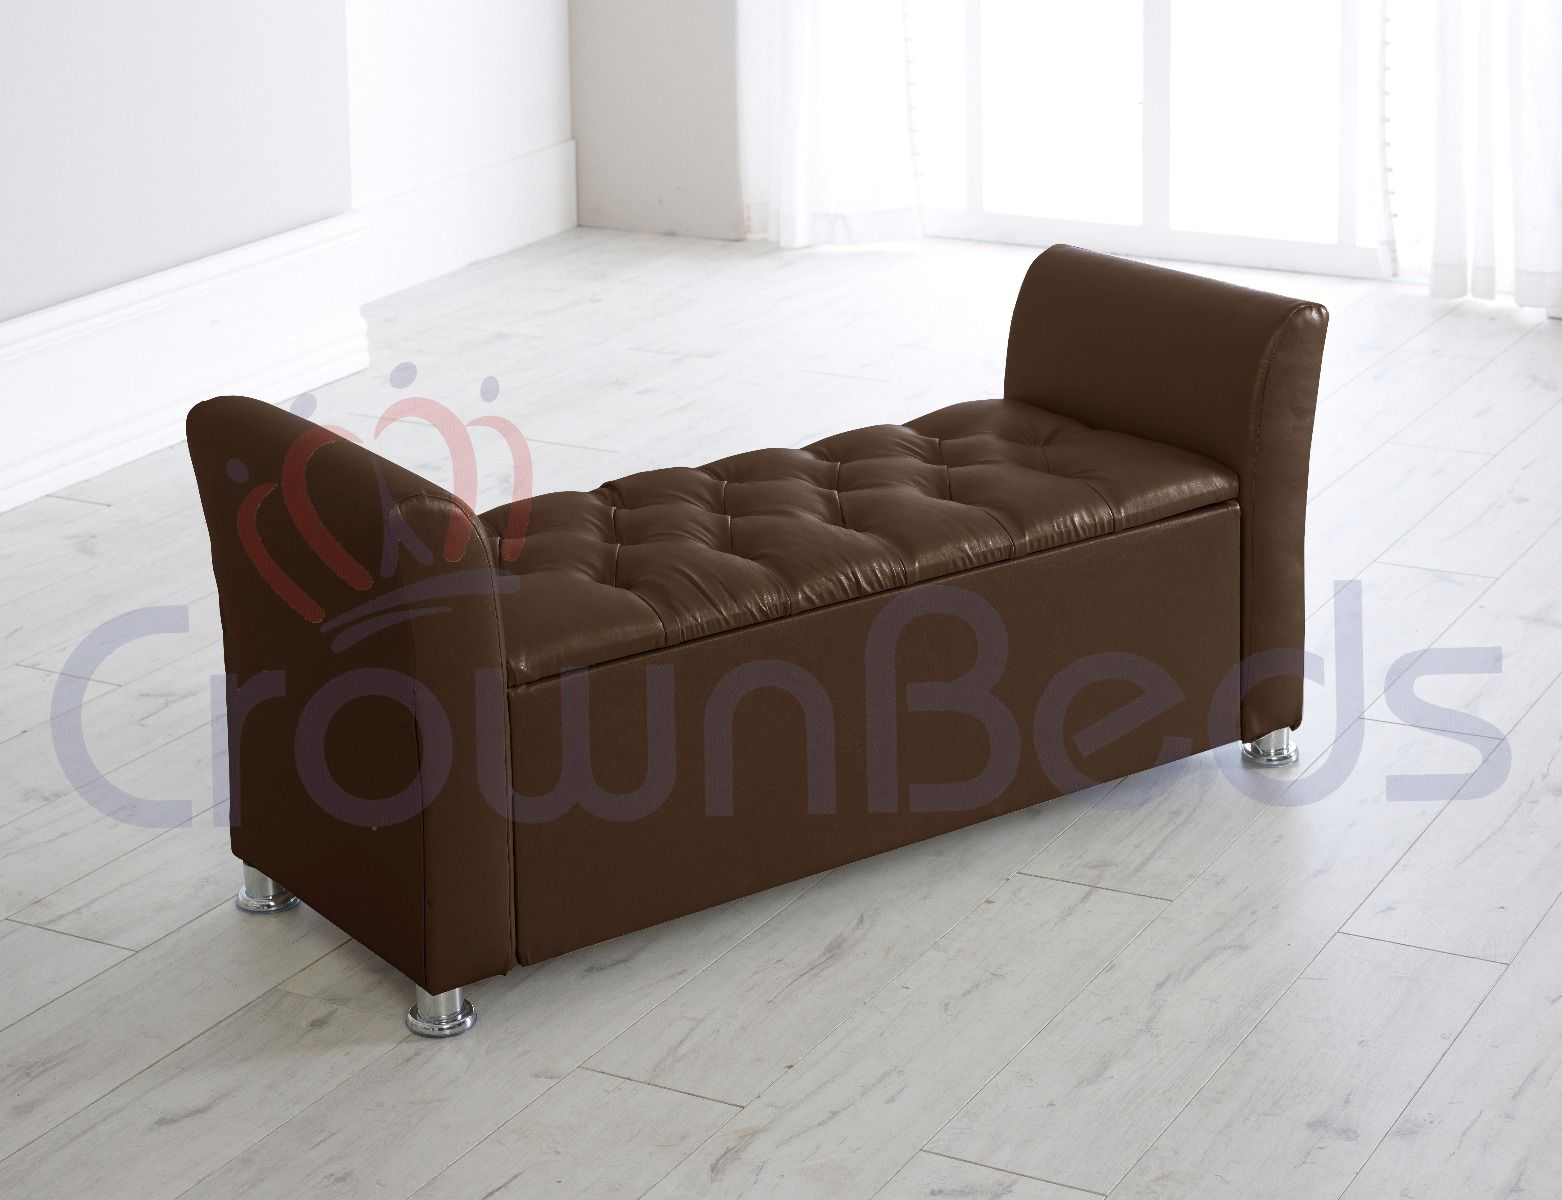 paris faux leather ottoman storage box with resting arms diamante brown